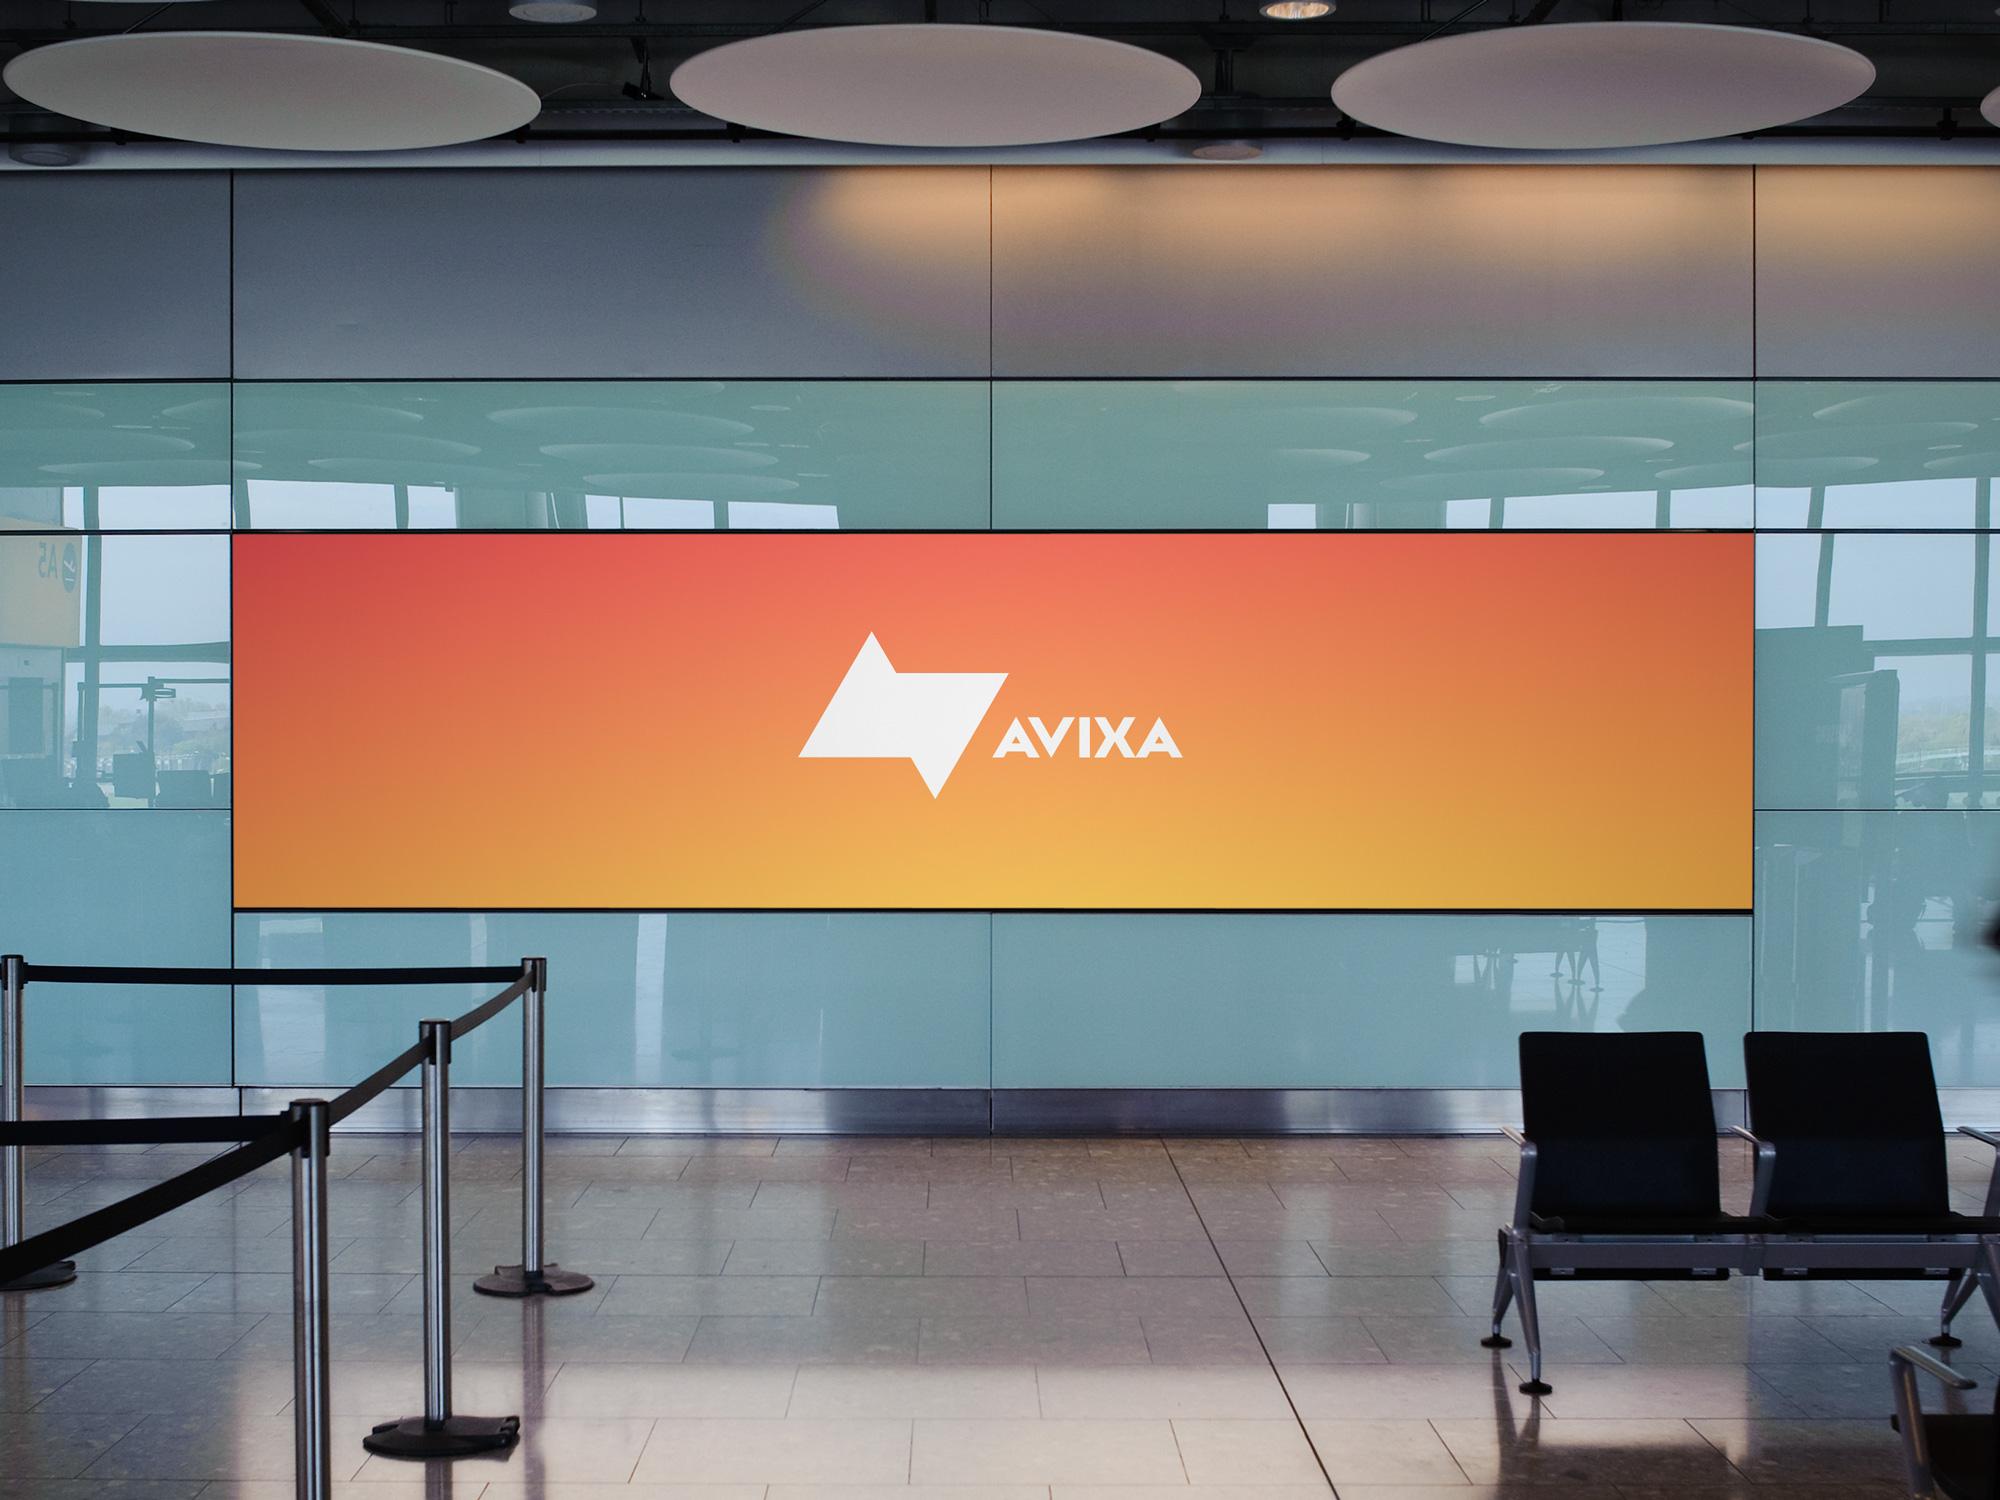 avixa-application-enviromental-2